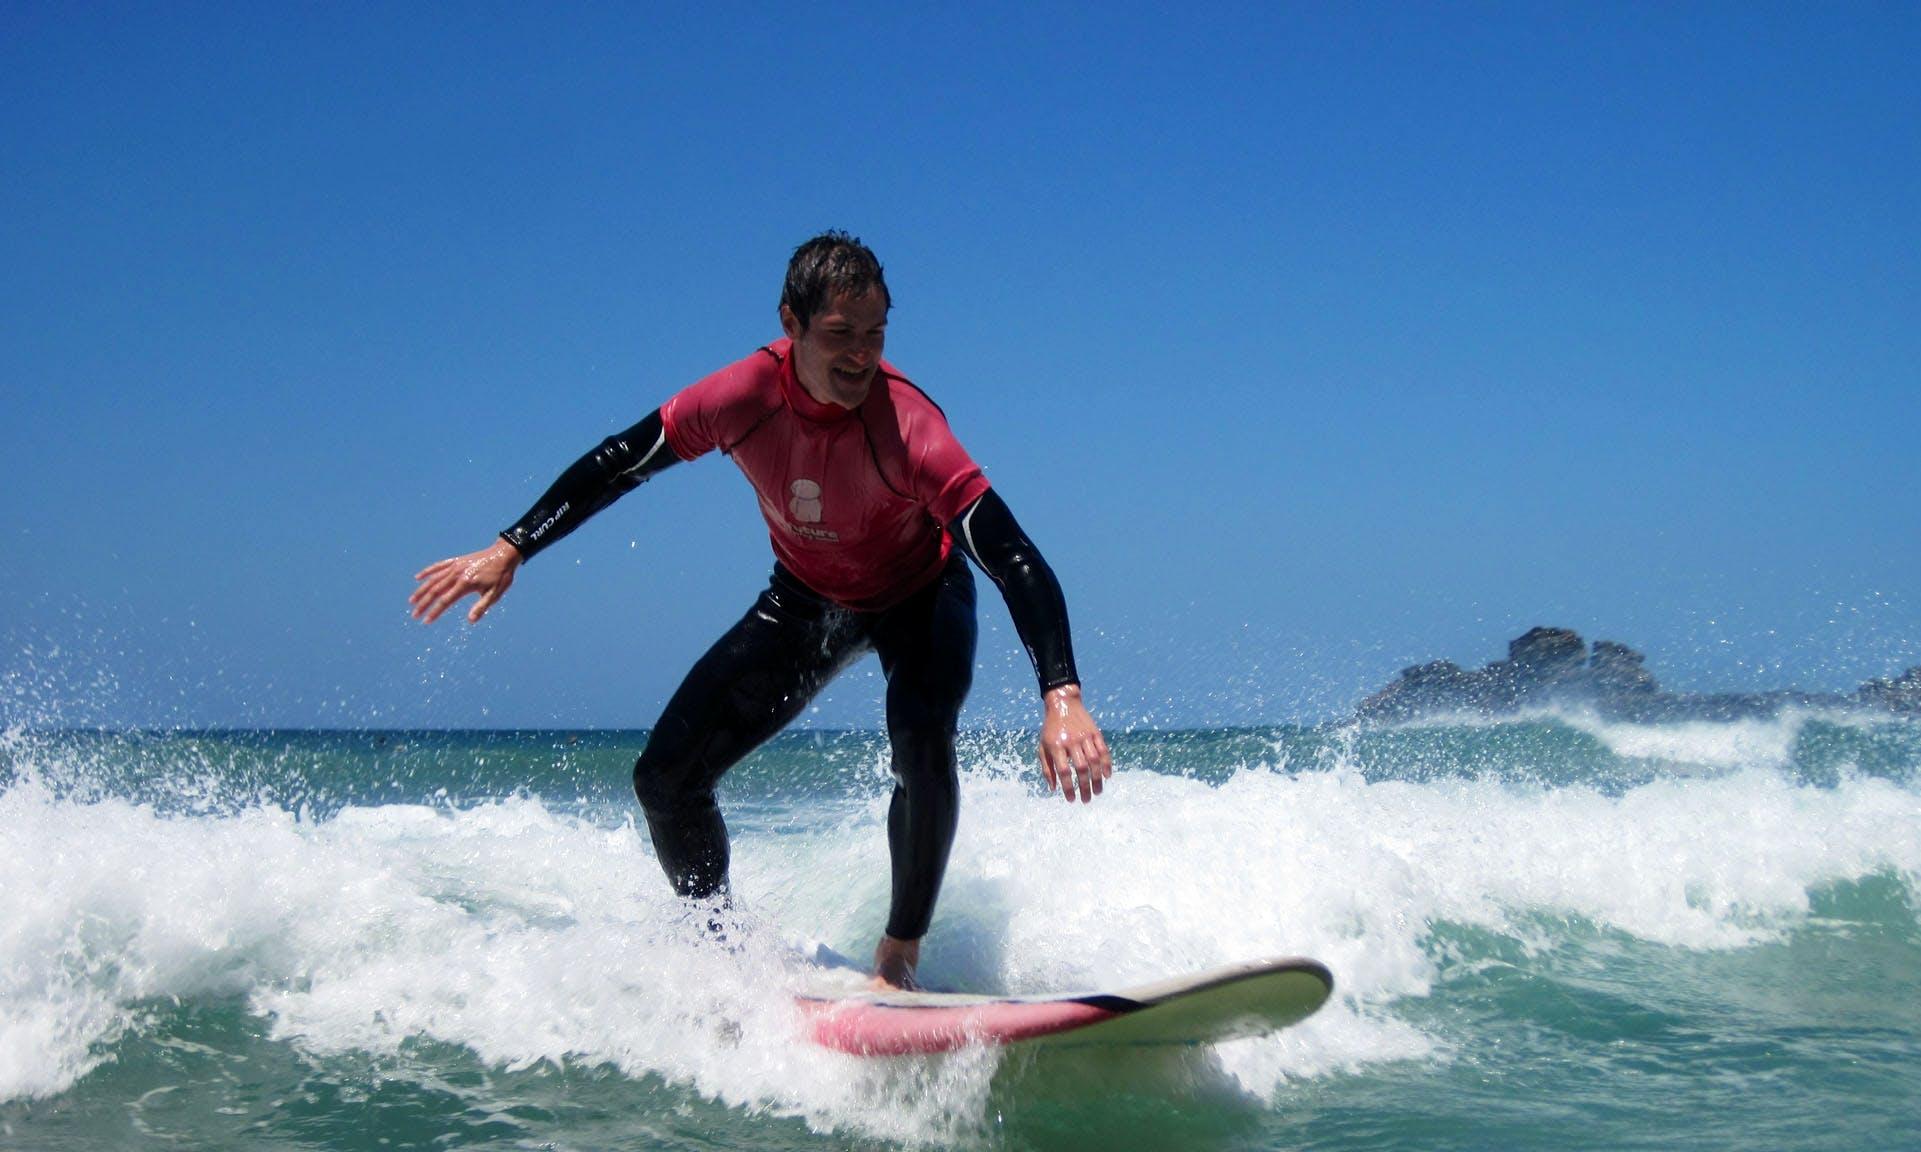 Surf Lessons on the Algarve Coast, Portugal